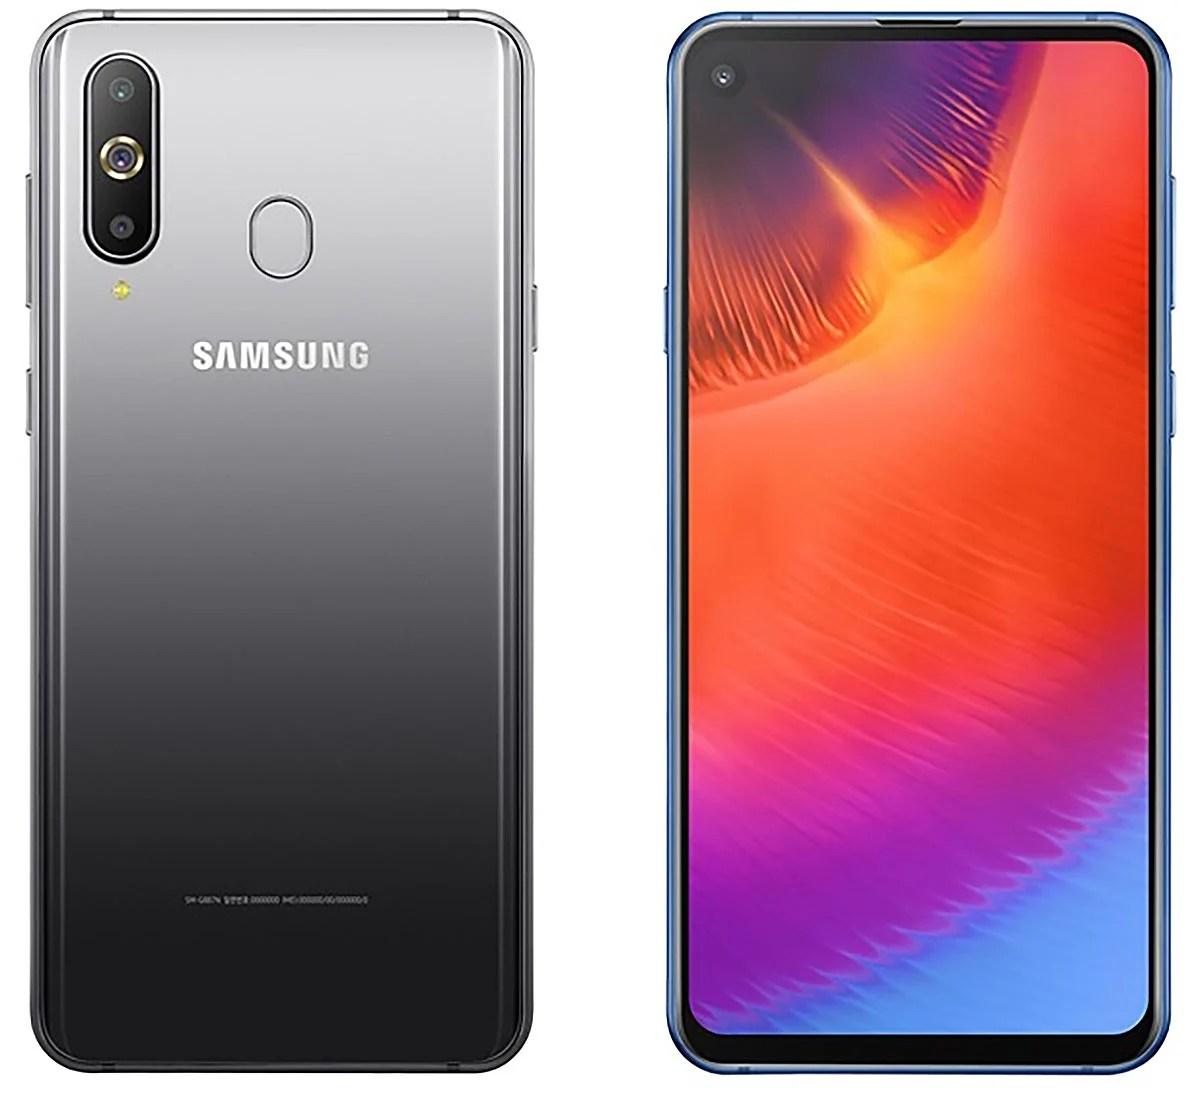 Galaxy A8s à l'international, batterie du Galaxy S10 et les MVNO contre Orange – Tech'spresso